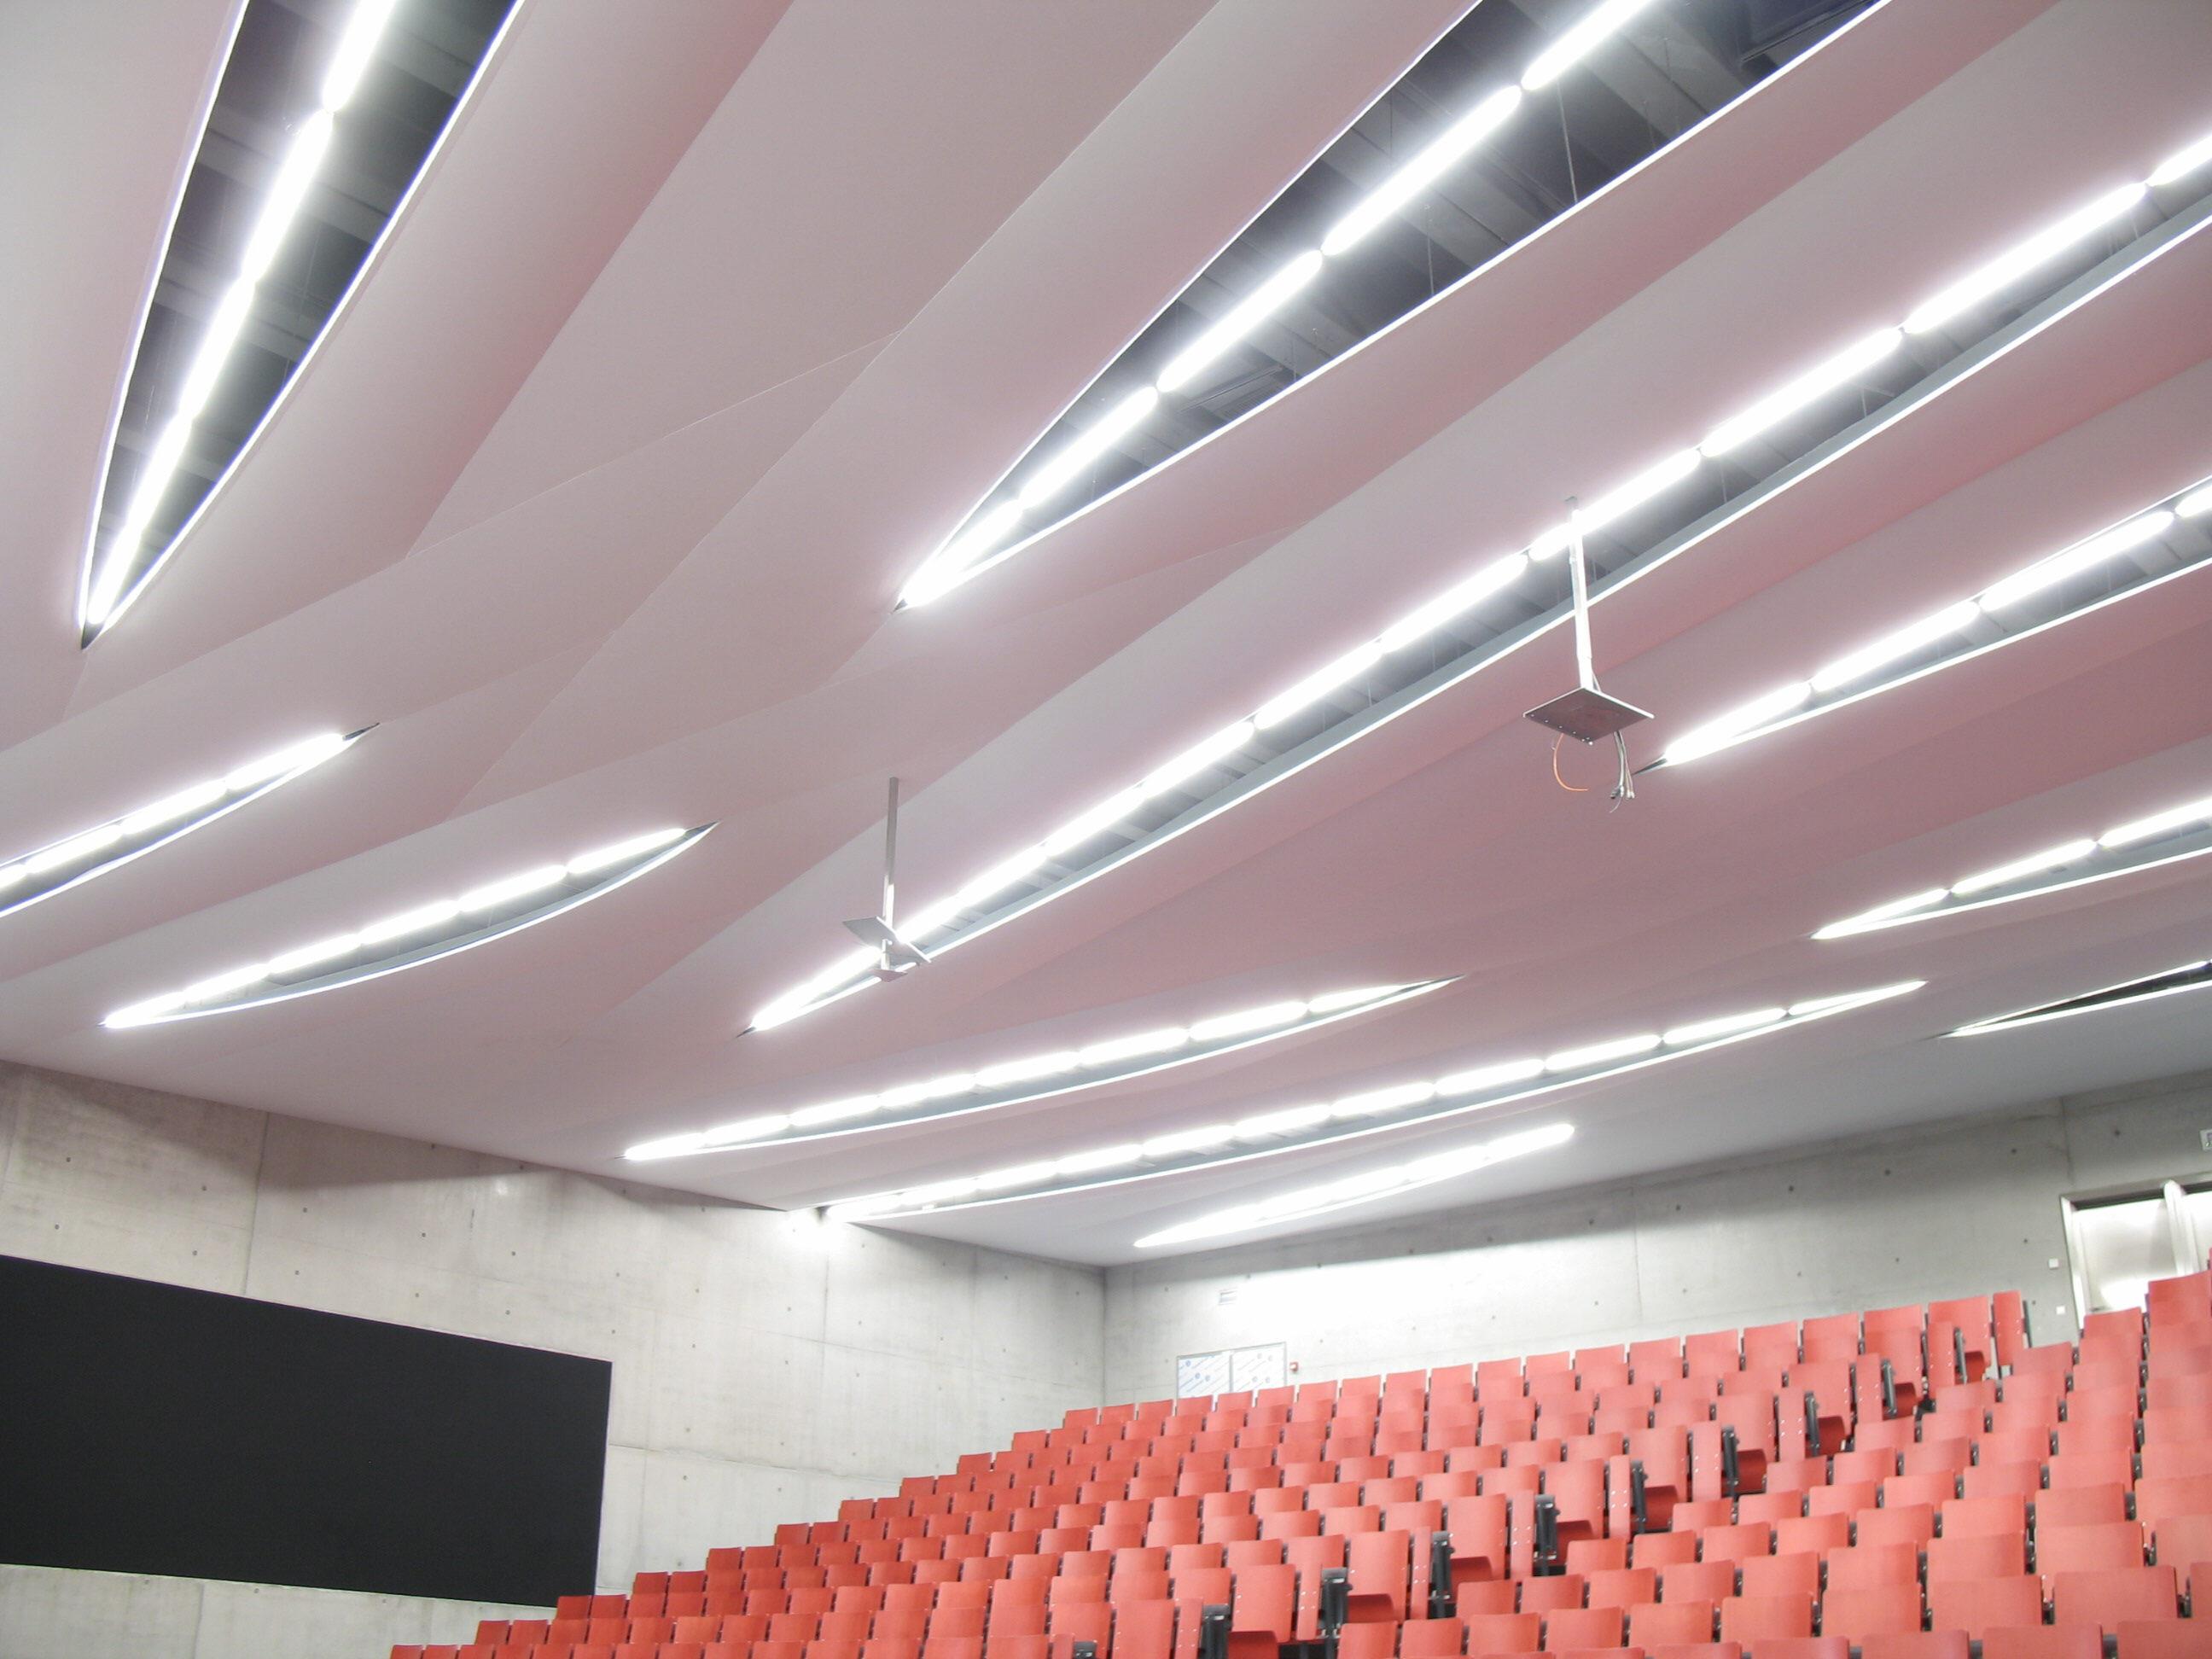 associated center normal recreation ceilings and ceiling il state acoustic acoustical constructors landscape arc farm activity